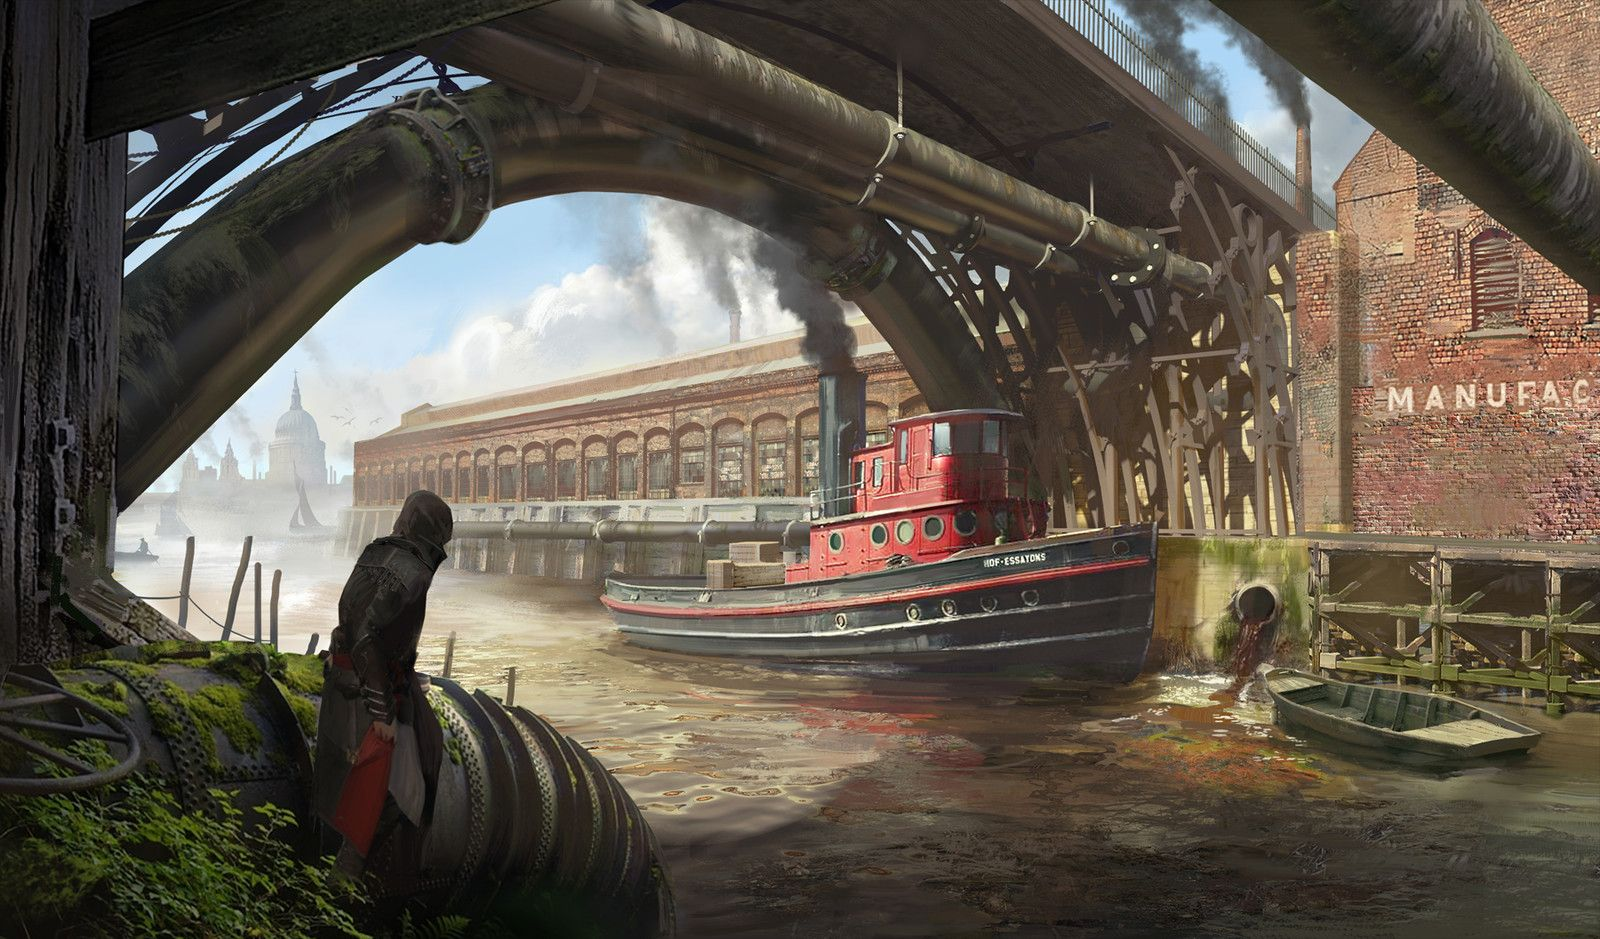 Iron Bridge, Hugo Puzzuoli on ArtStation at https://www.artstation.com/artwork/ay3z8